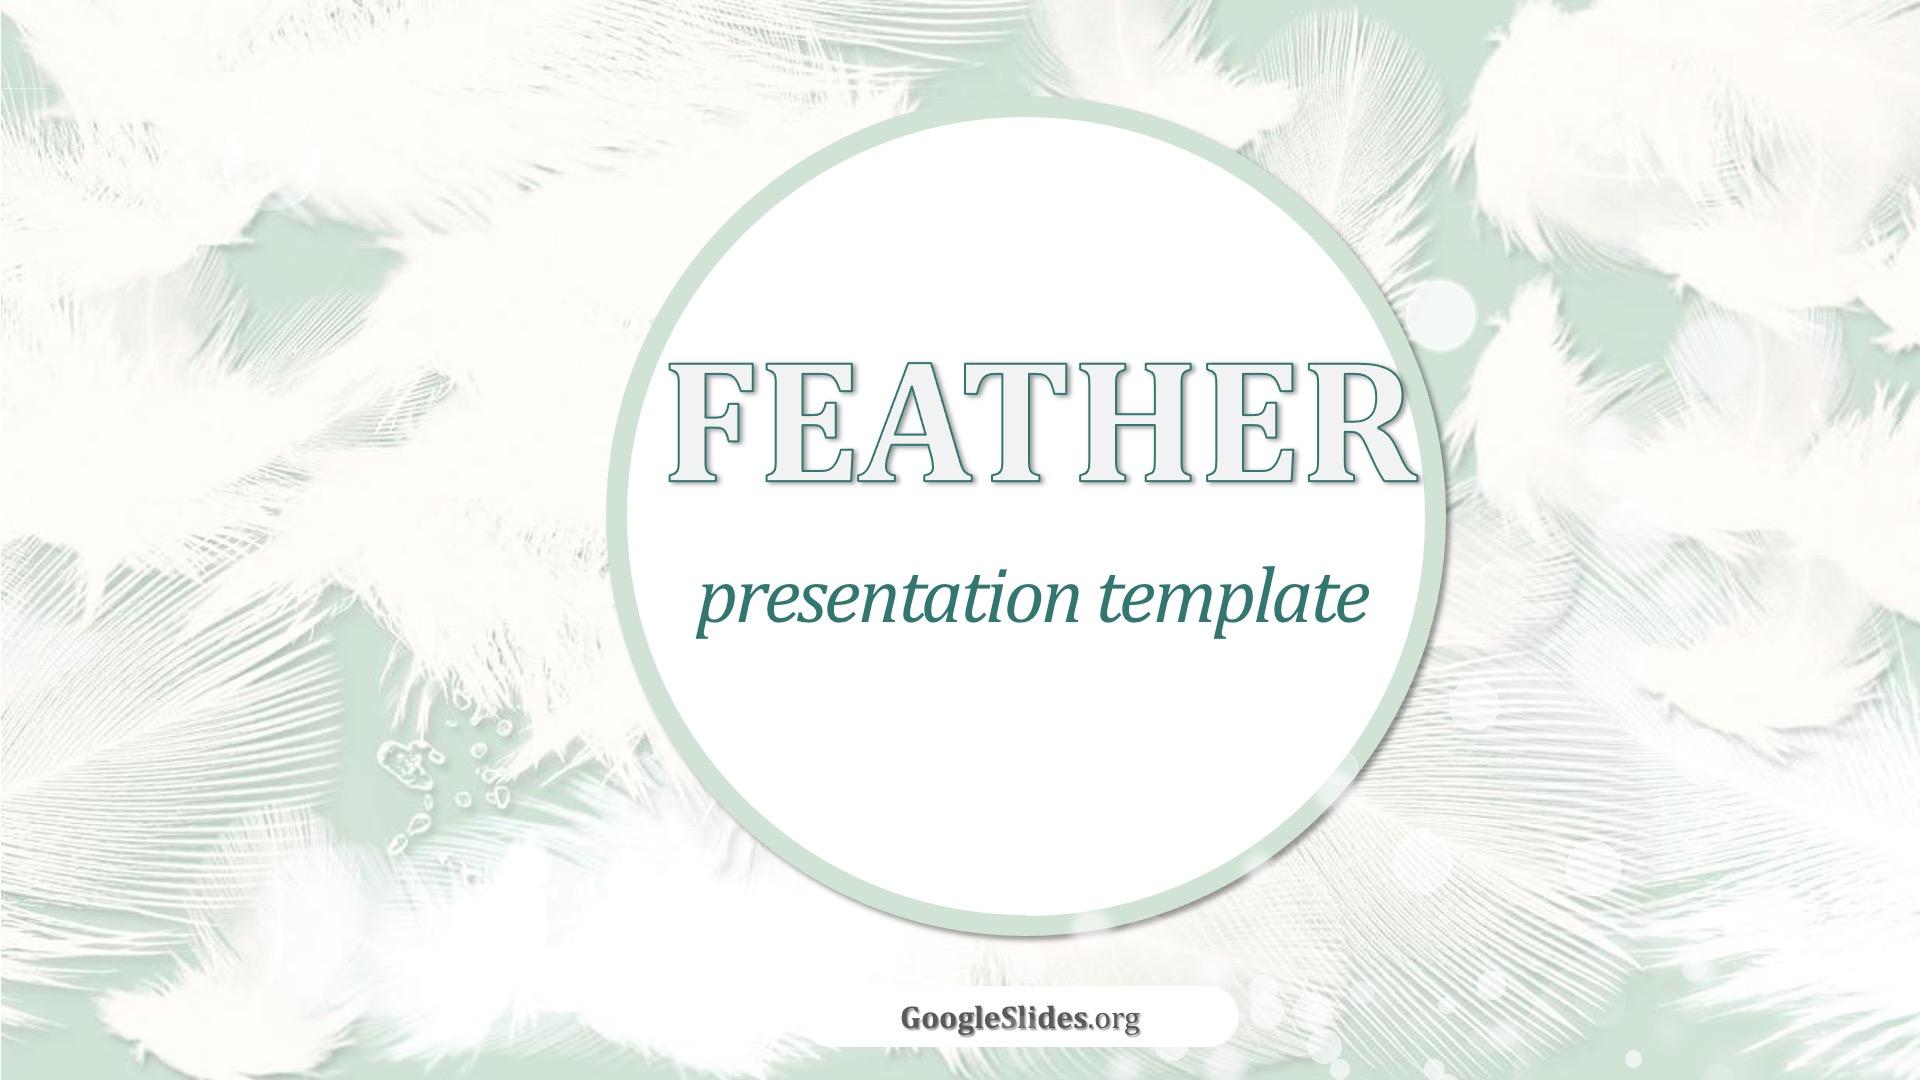 Feather Slides Presentation